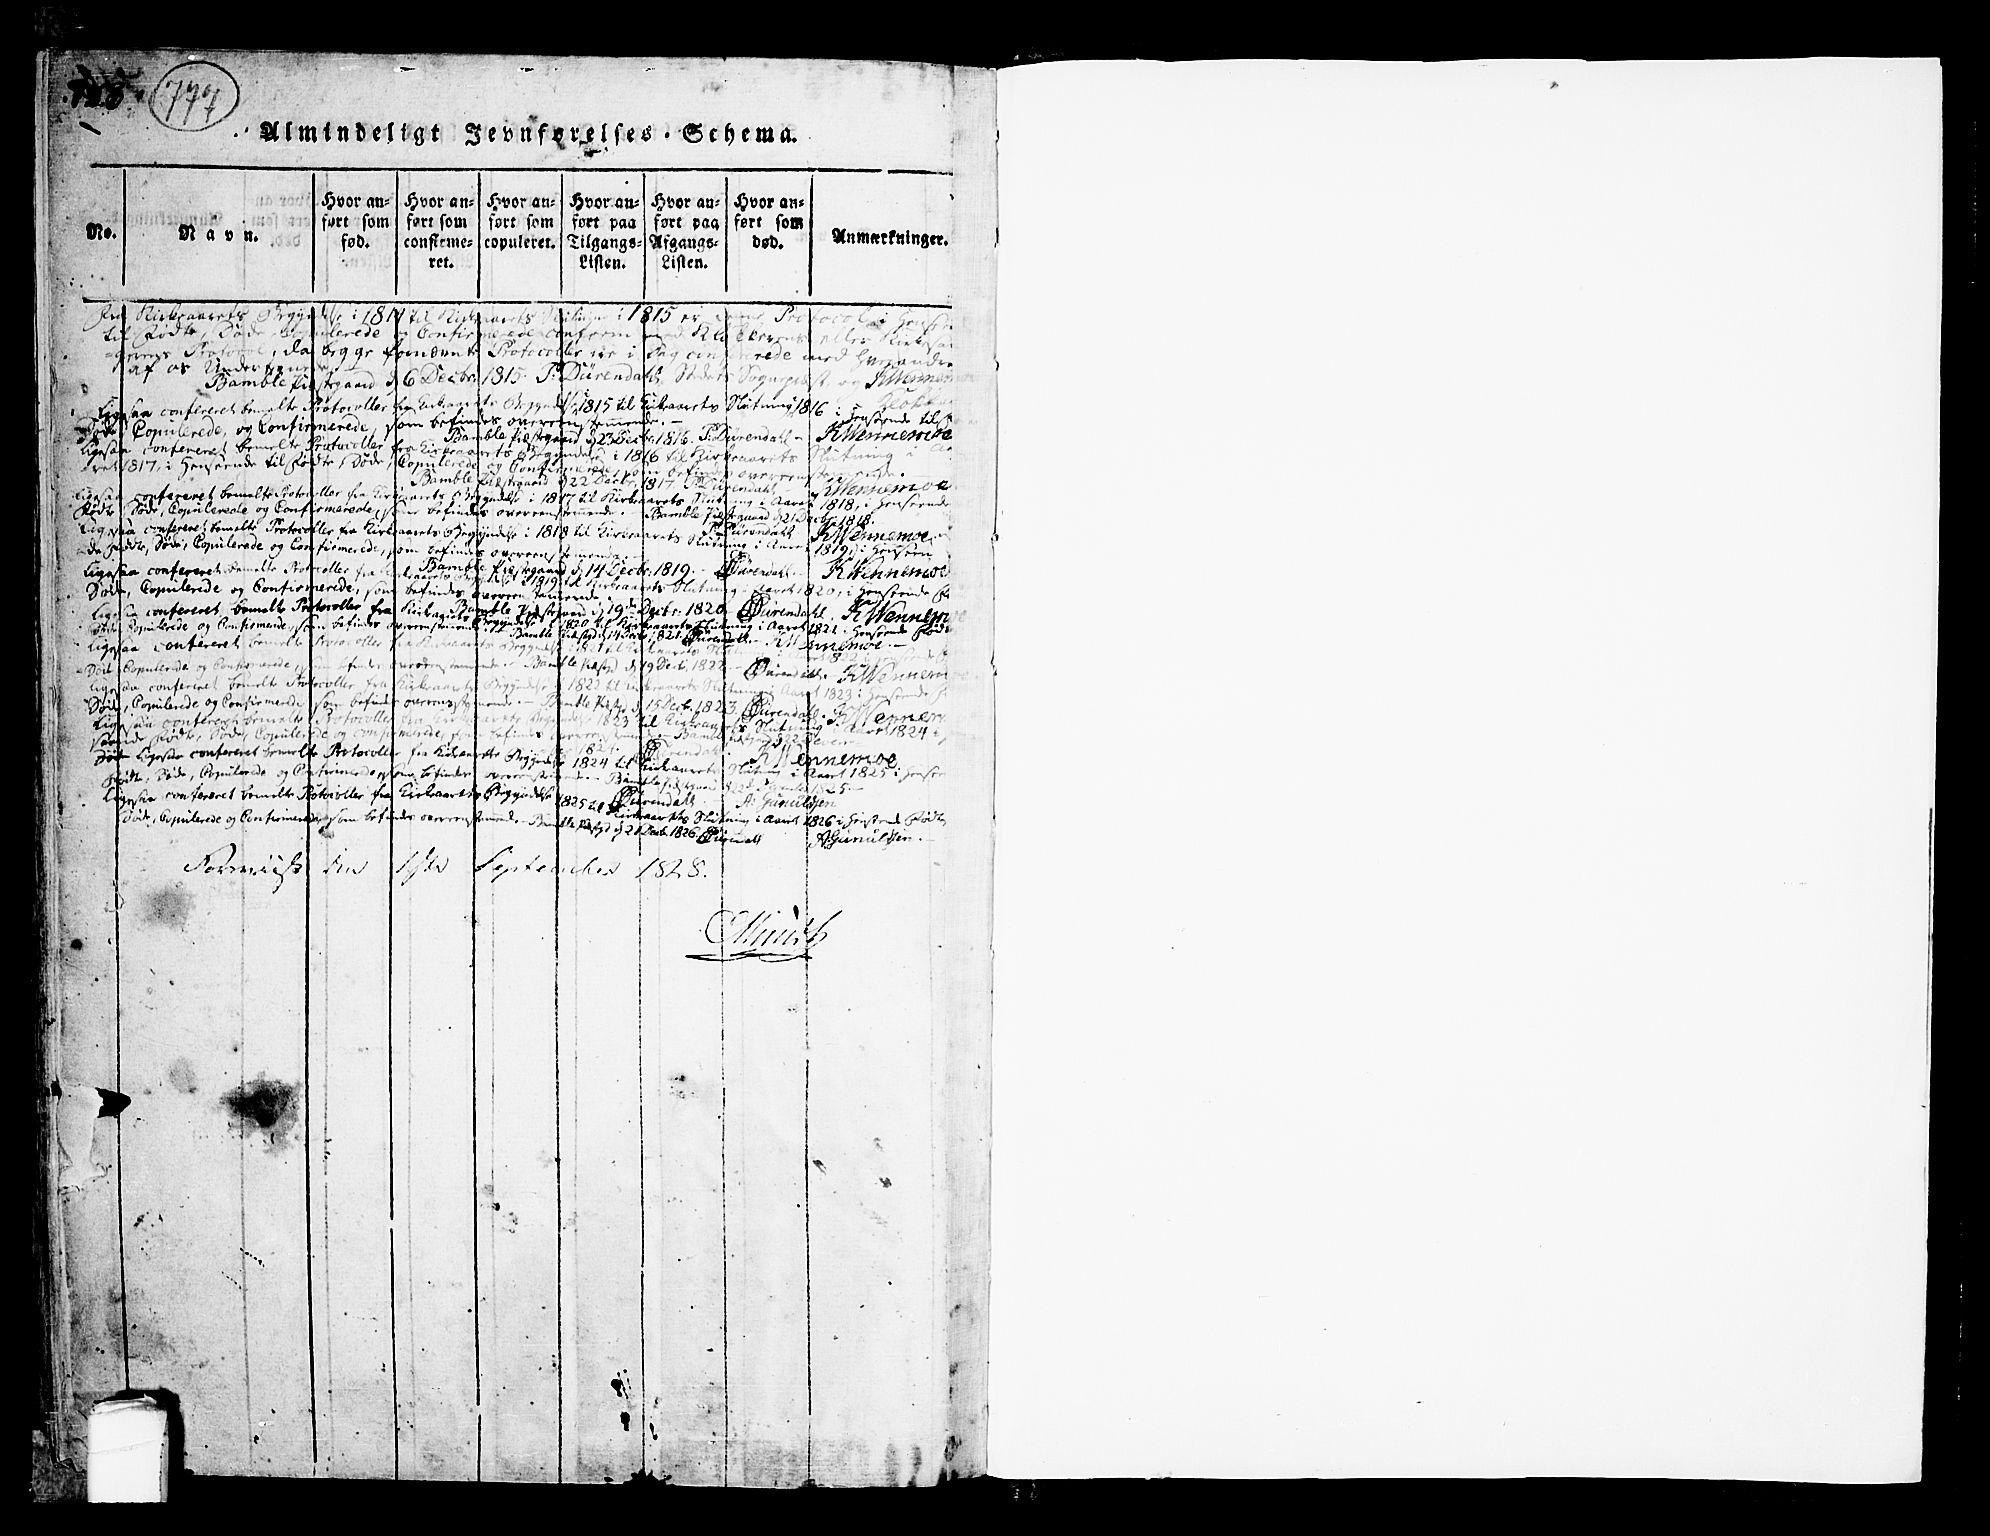 SAKO, Bamble kirkebøker, F/Fa/L0003: Ministerialbok nr. I 3 /1, 1814-1834, s. 777-778